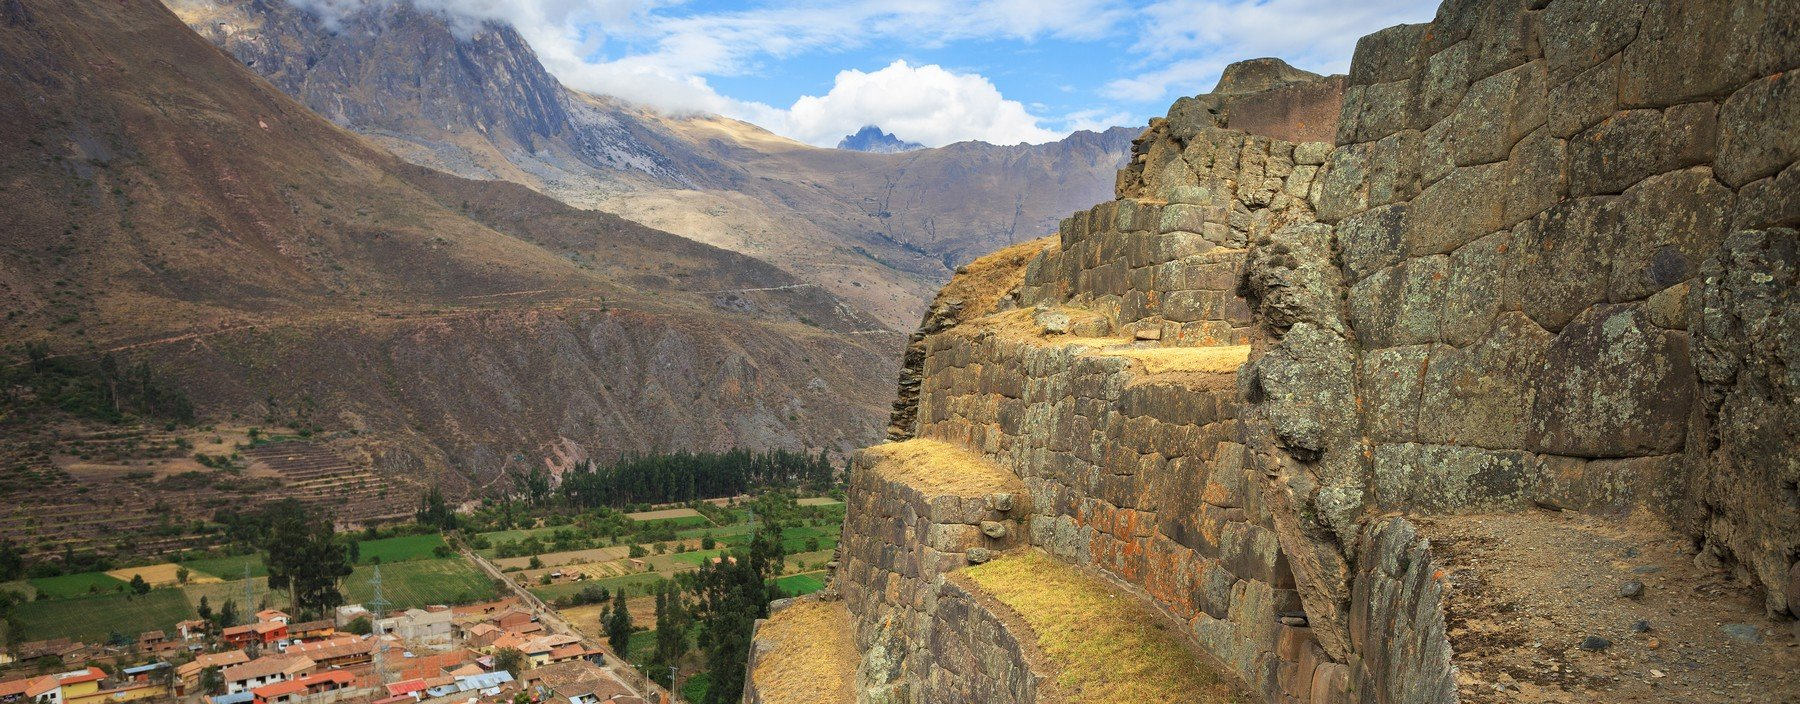 pe, heilige vallei, ollantaytambo inca citadel (2).jpg